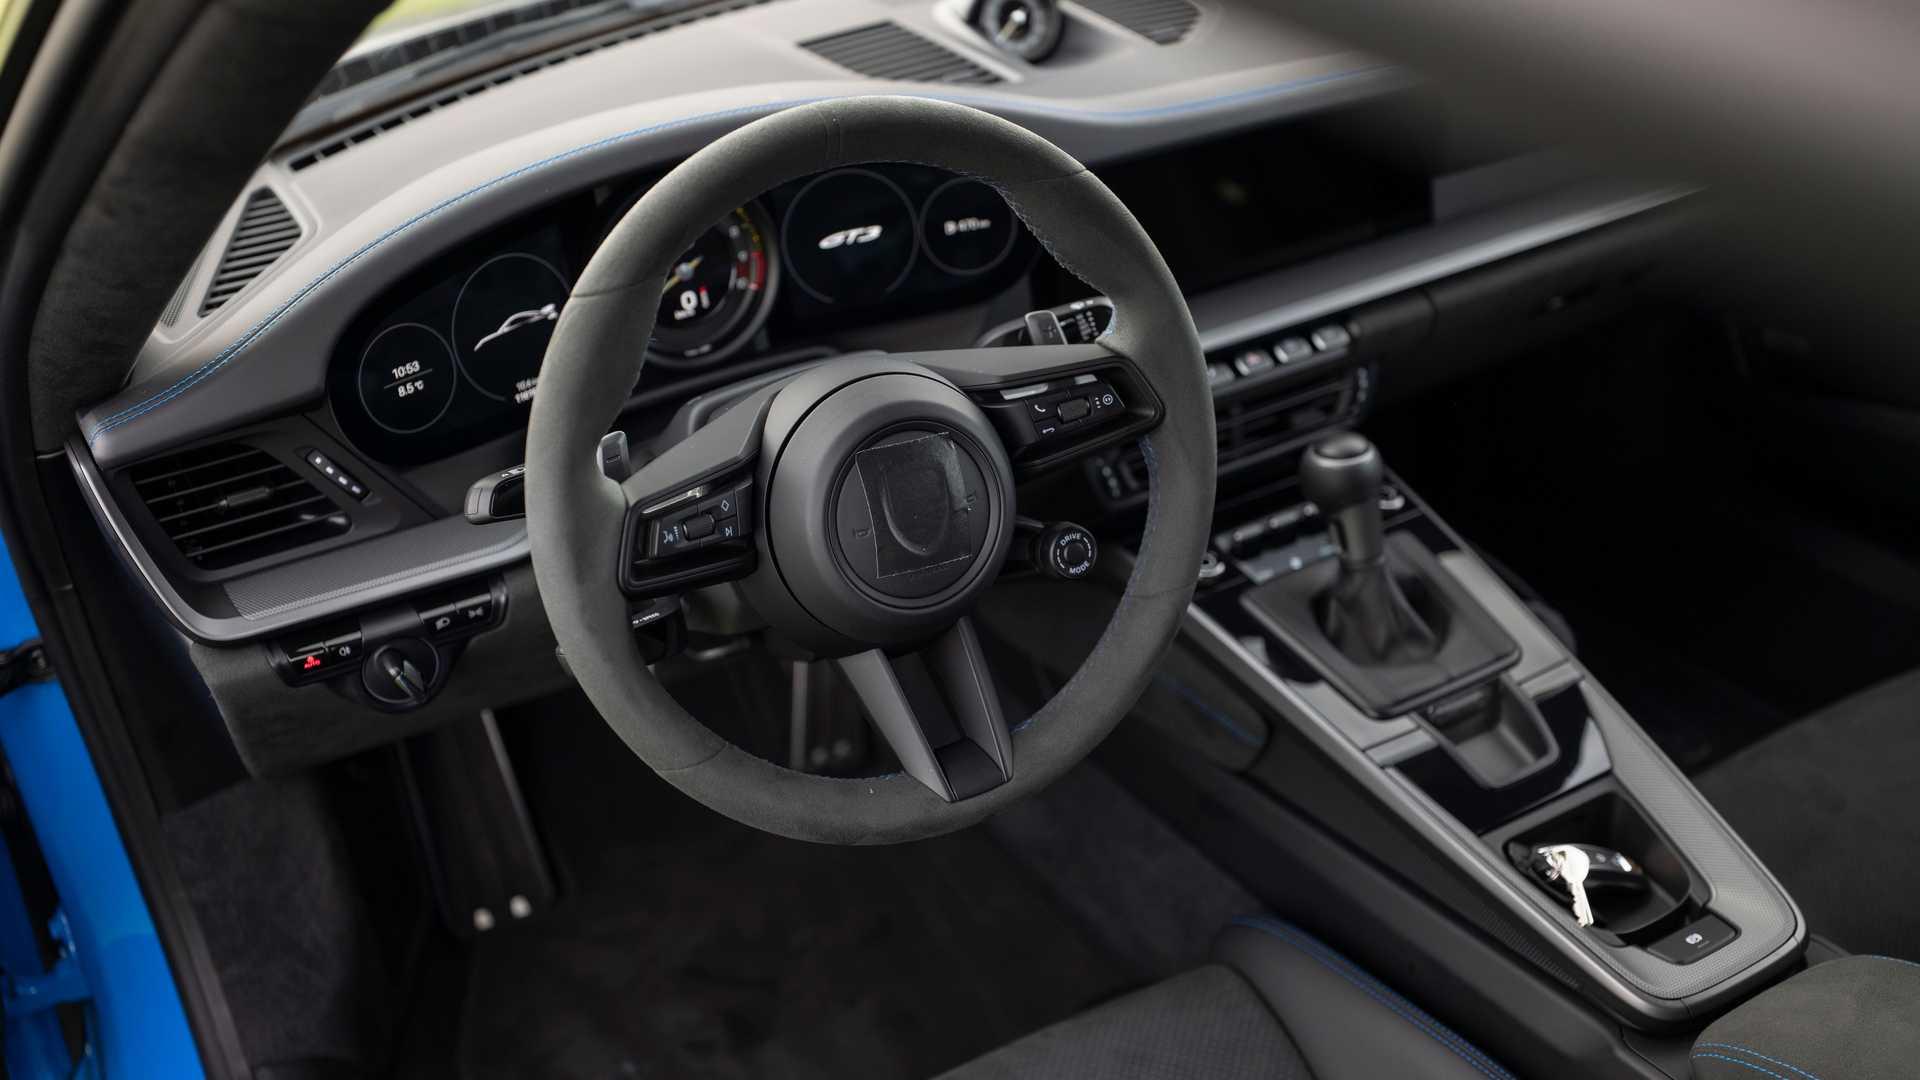 2021-porsche-911-gt3-prototype-driver-s-seat